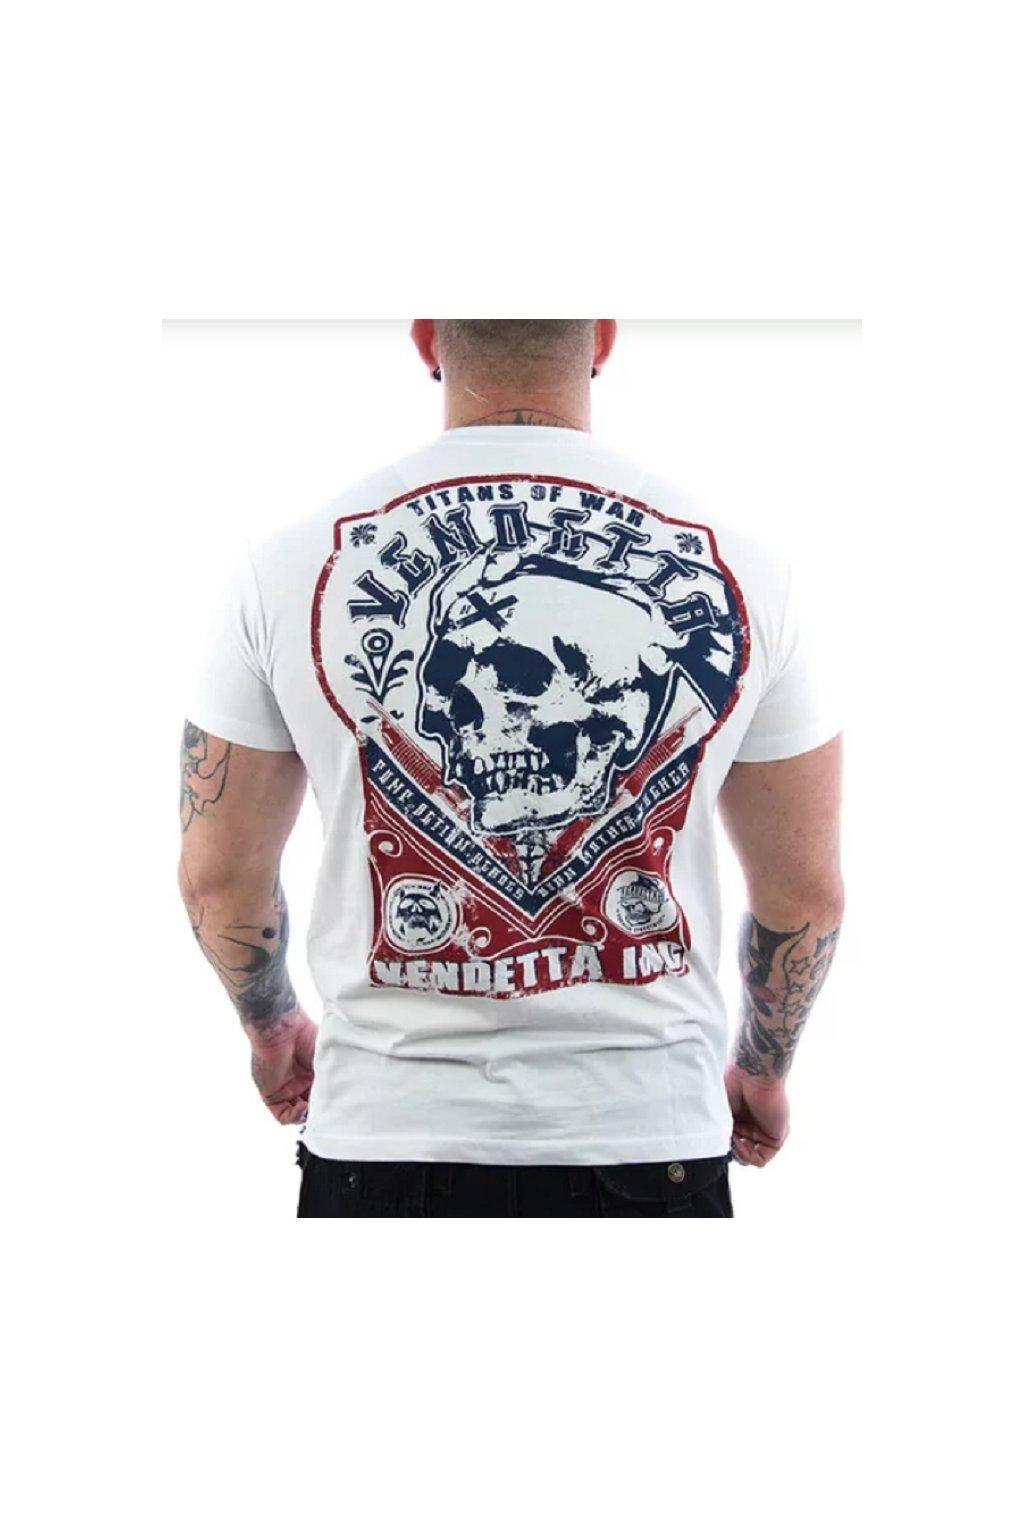 Pánské triko Vendetta Inc.Titans weiß VD-1093 obr1